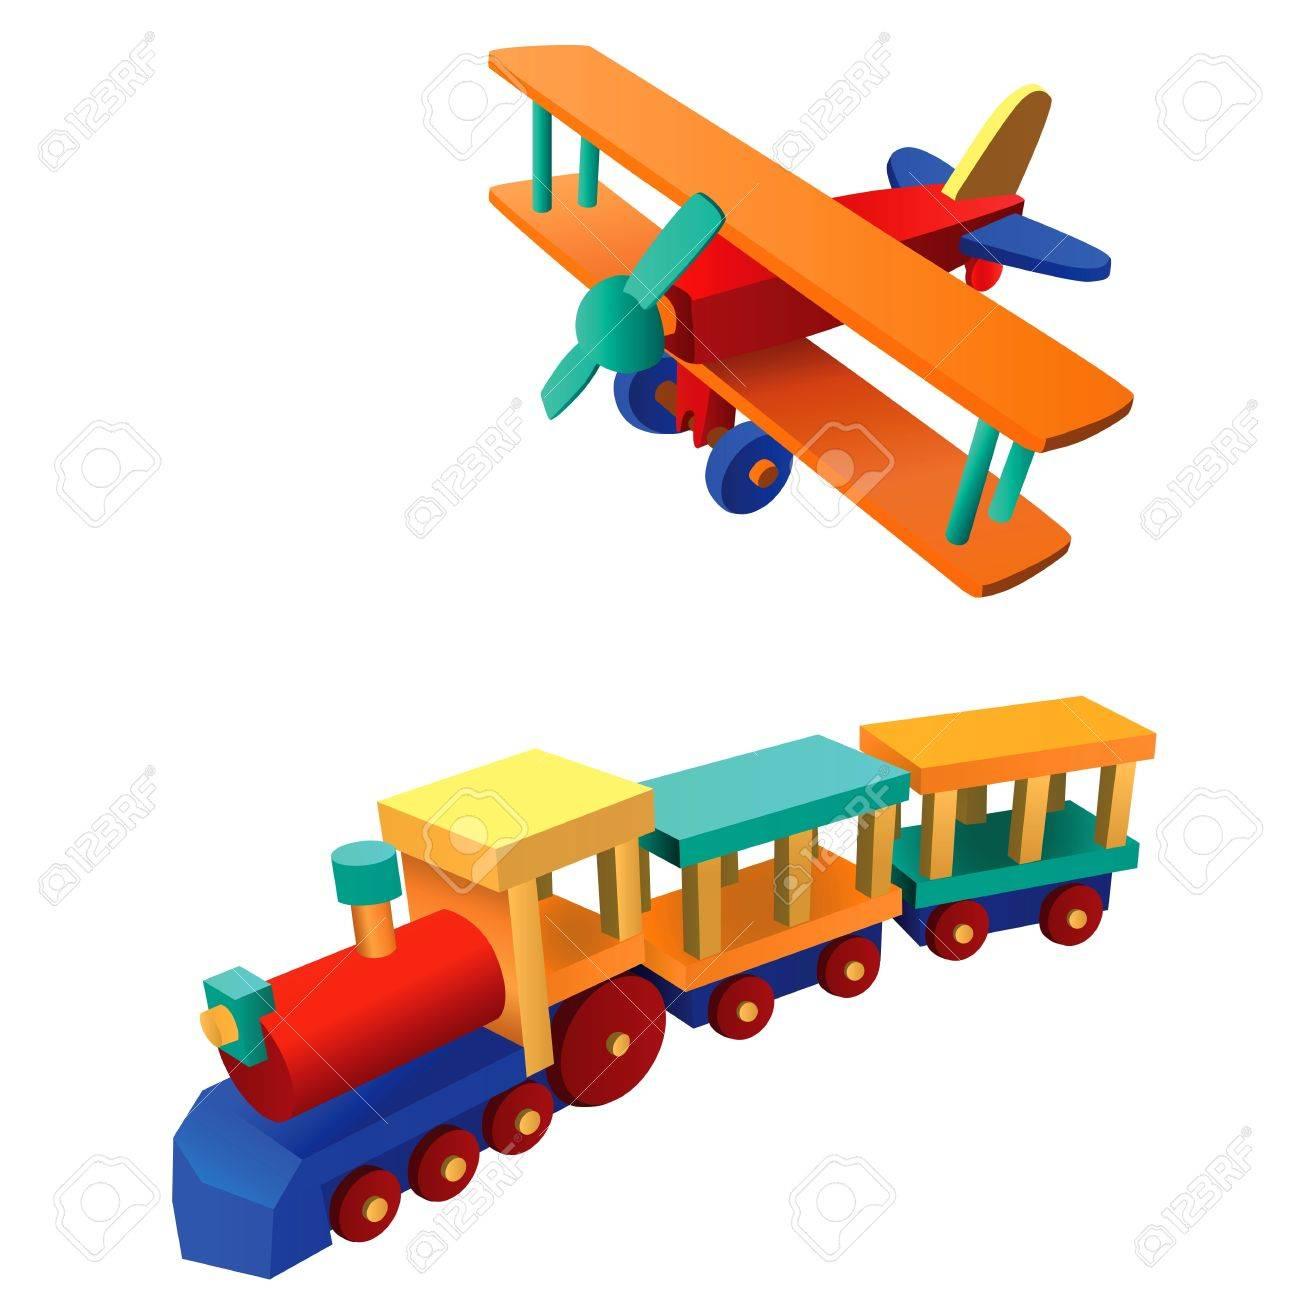 toy illustration - 9247525